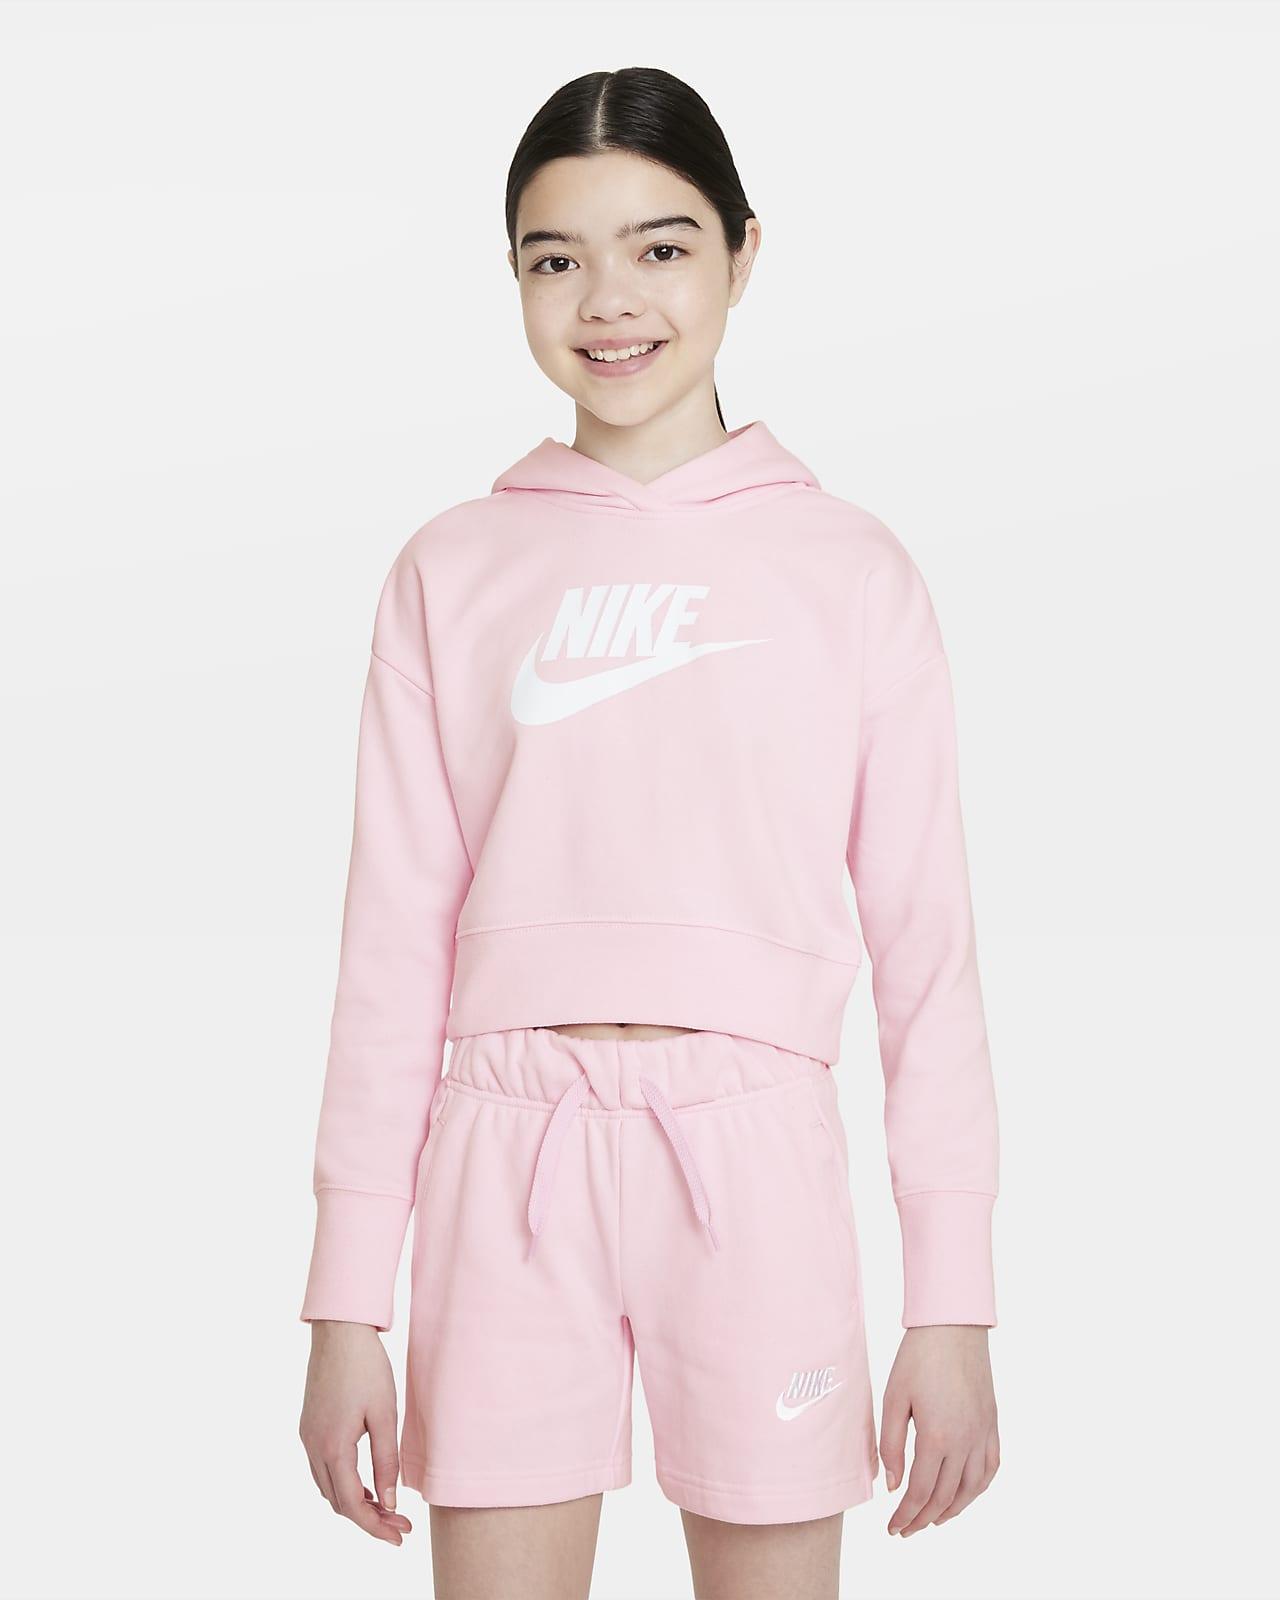 Kort huvtröja Nike Sportswear Club i frotté för ungdom (tjejer)